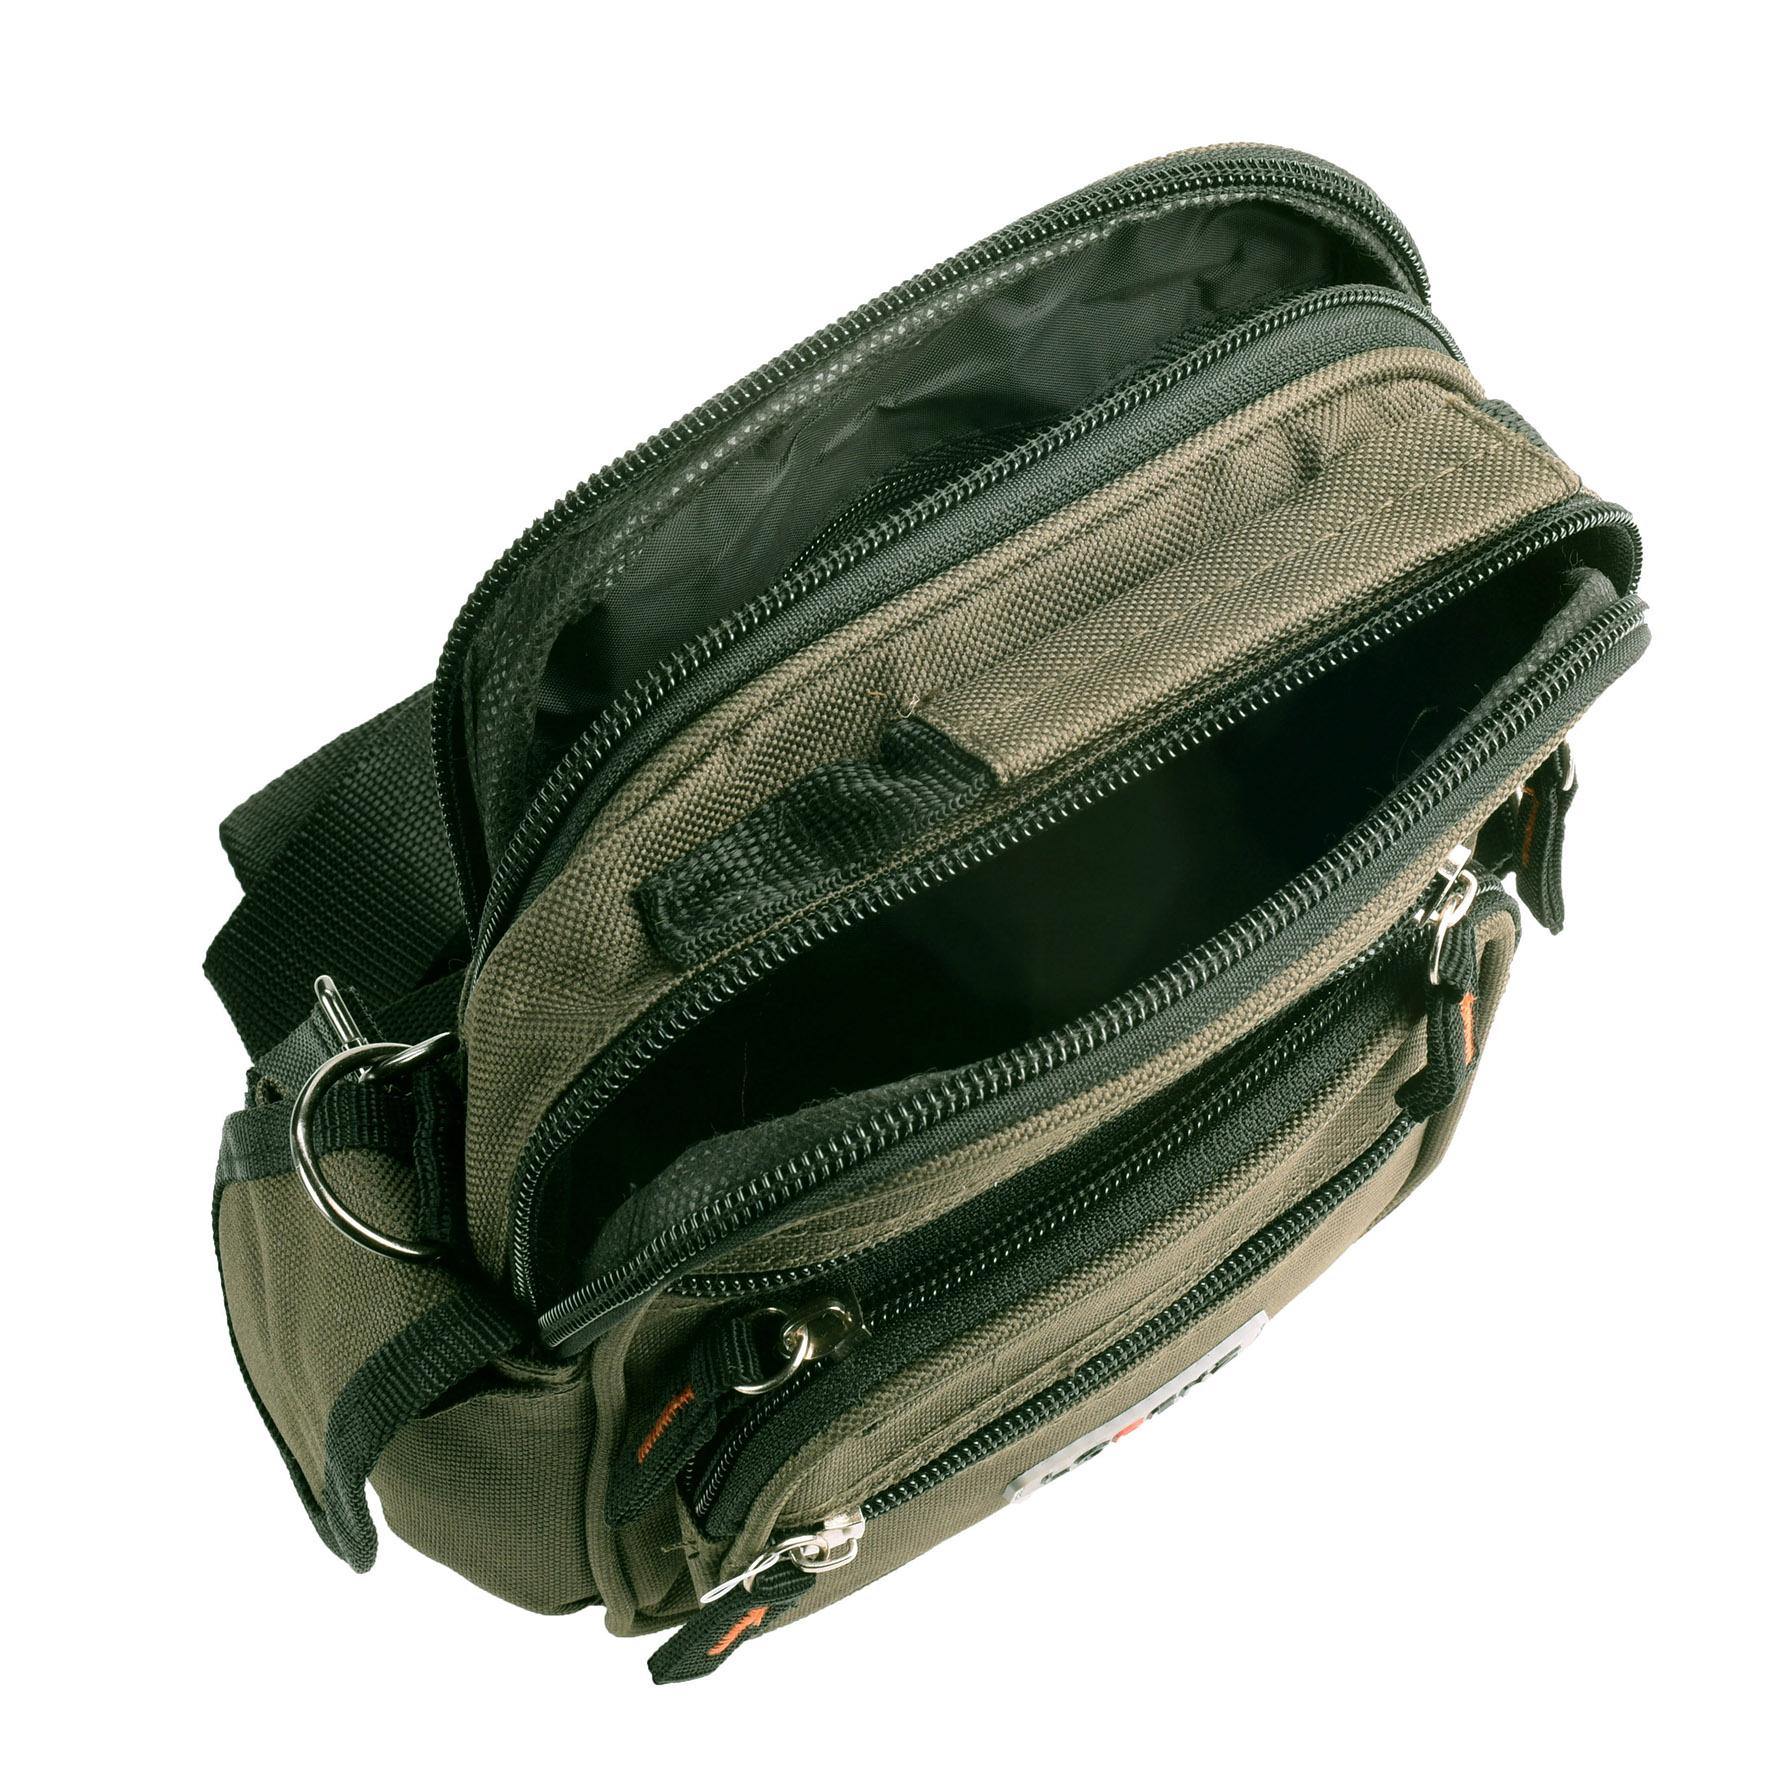 495d401d27 Canvas Multi-Purpose Camera Travel Bag Detachable Strap Belt Loop ...